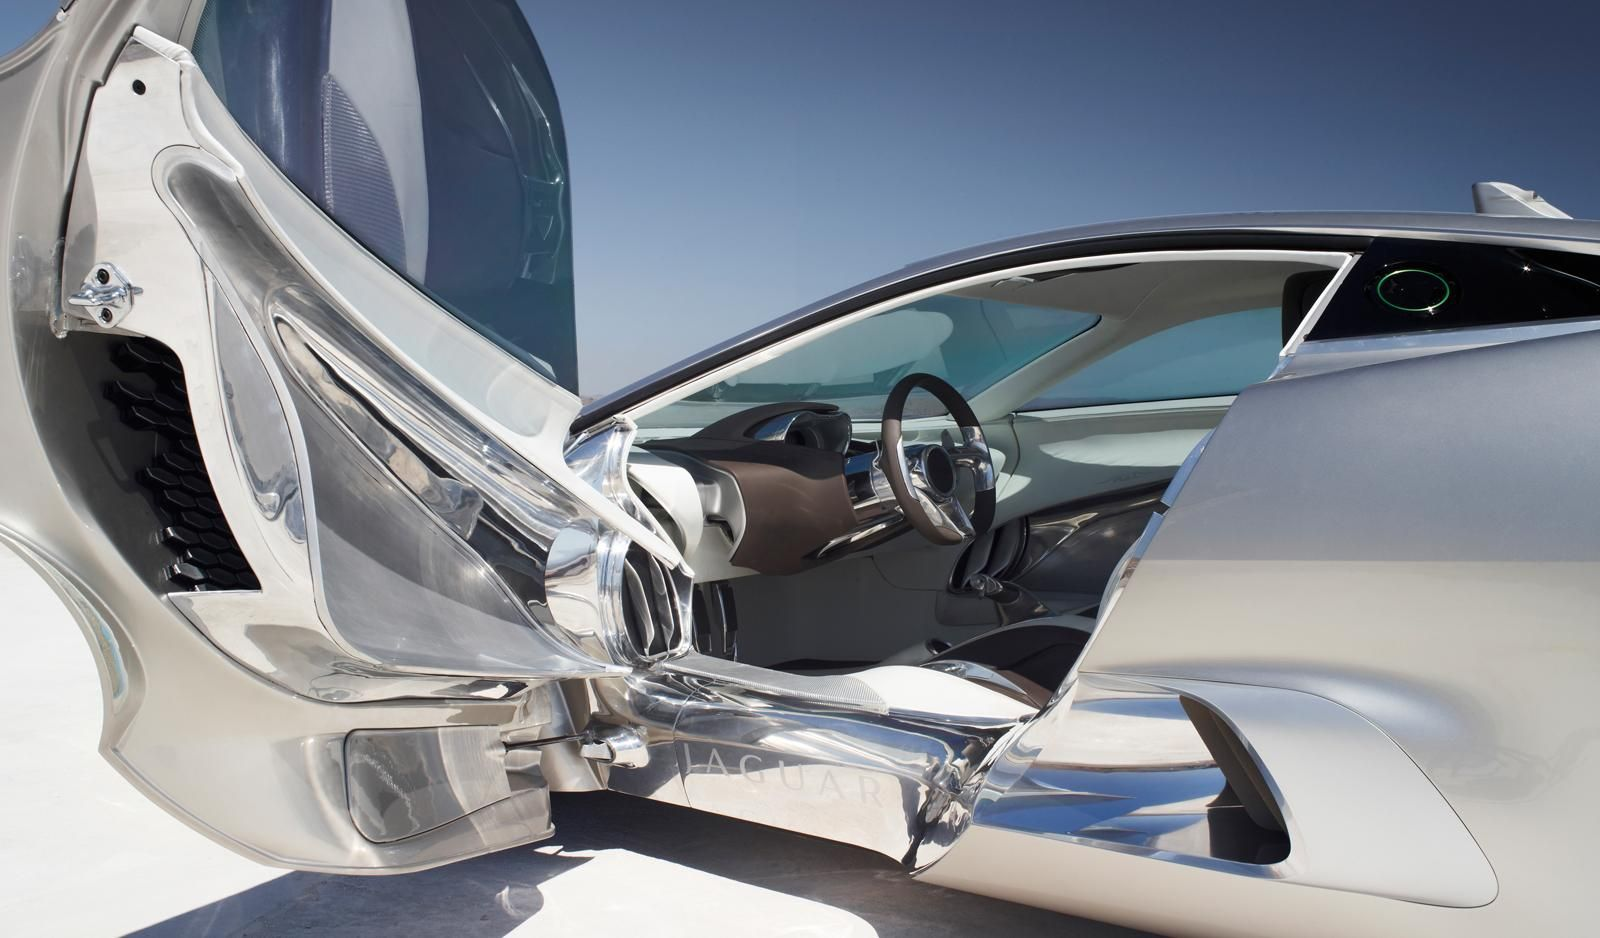 Jaguar Cx75 Open Door Dream Car Garage Pinterest Cars